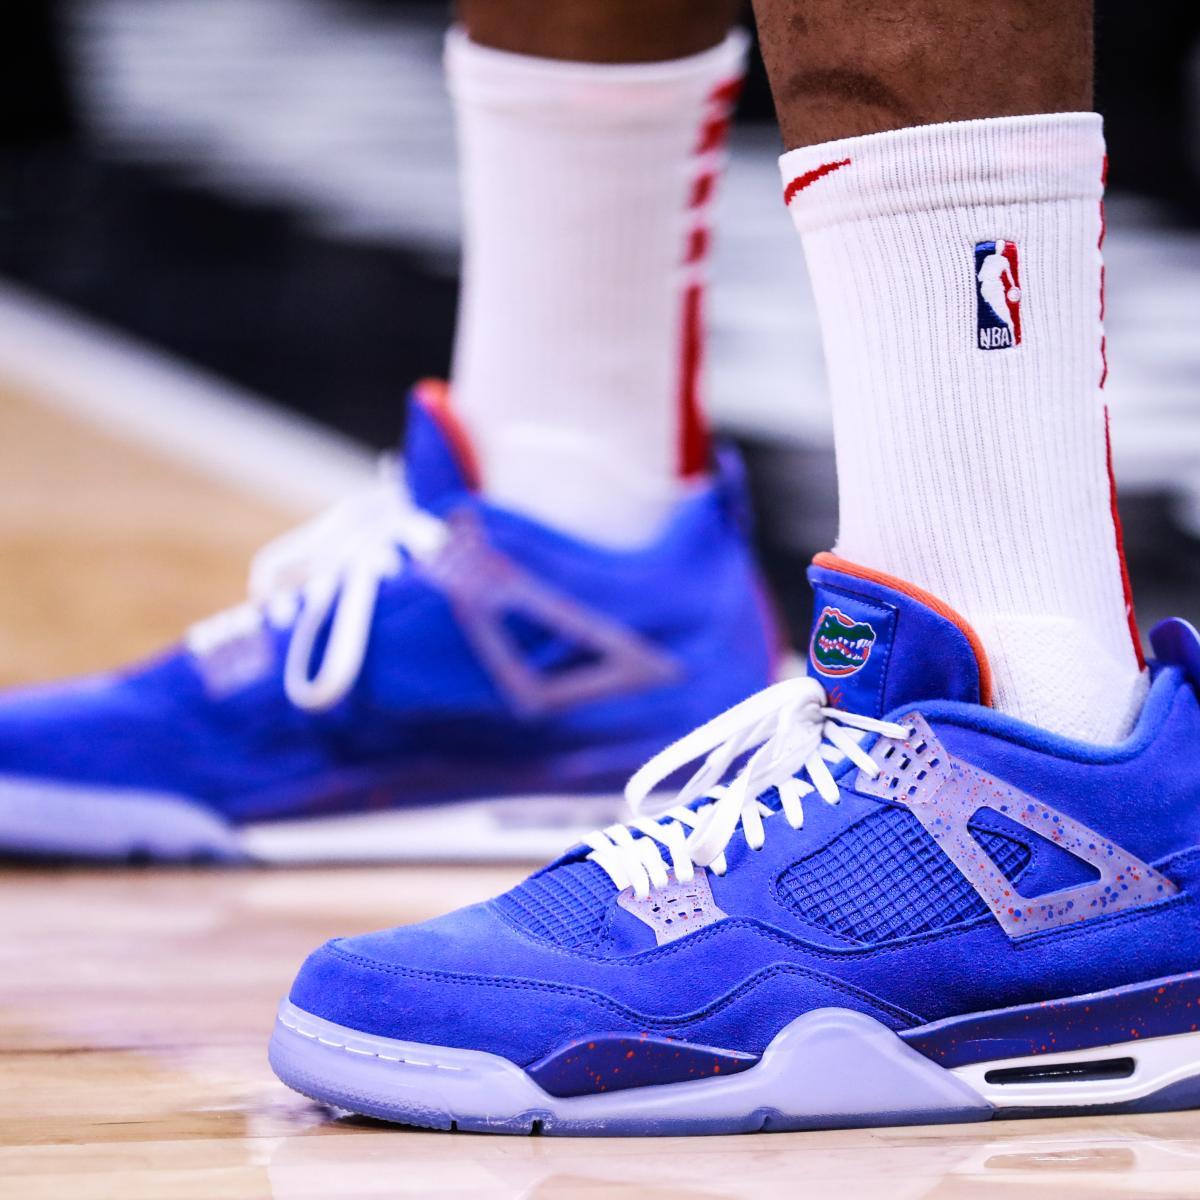 7d63c63443740a B R Kicks x NBA Nightly  PJ Tucker Wears Gators Air Jordan 4 and More